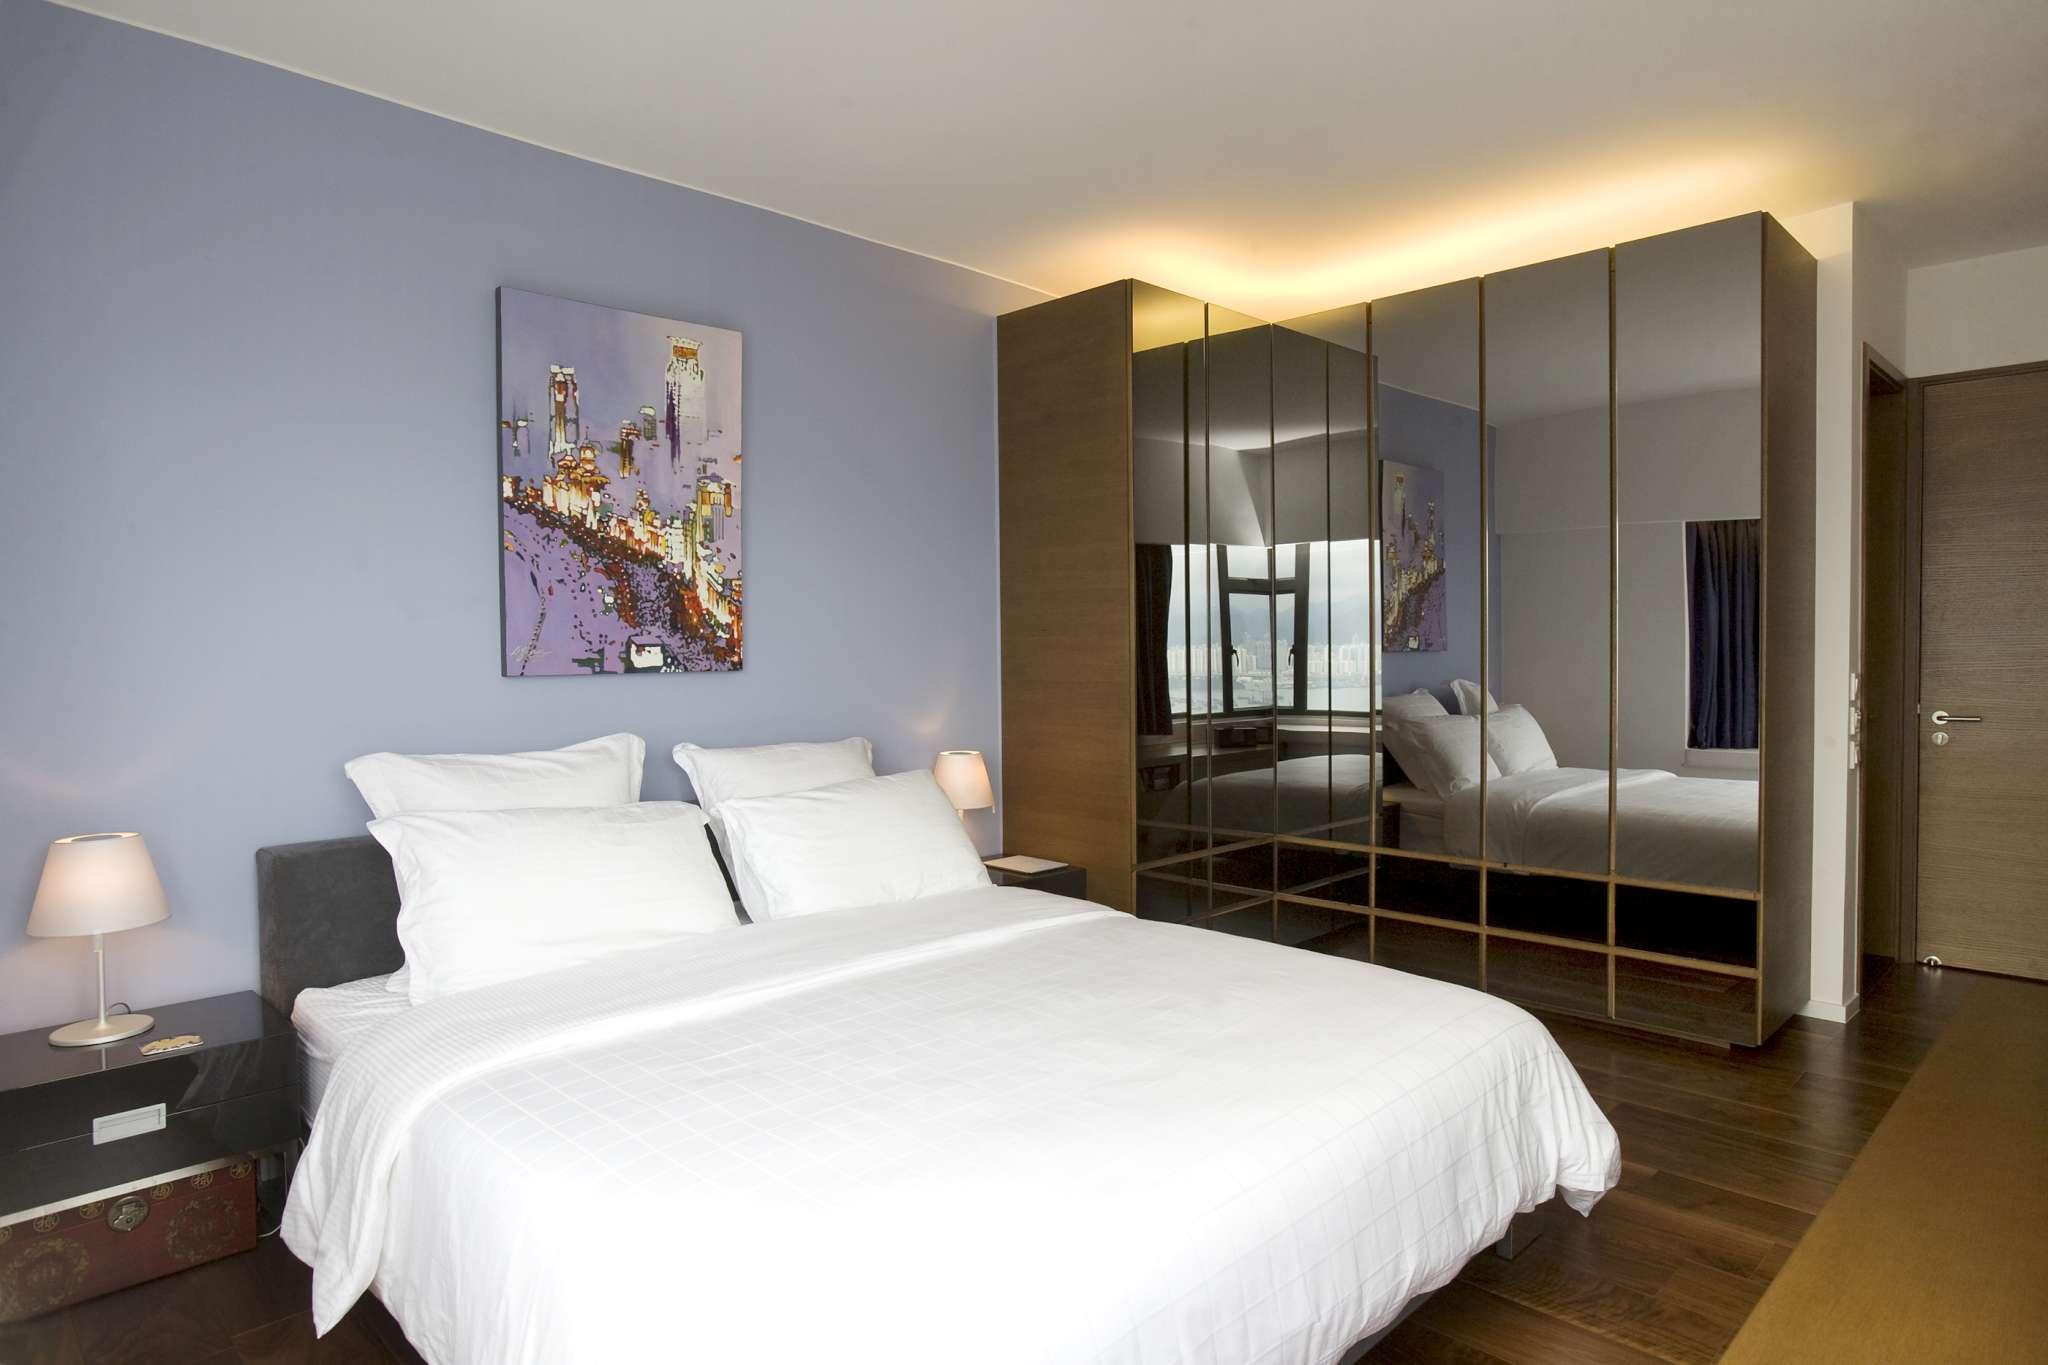 robinson place a clifton leung design workshop. Black Bedroom Furniture Sets. Home Design Ideas